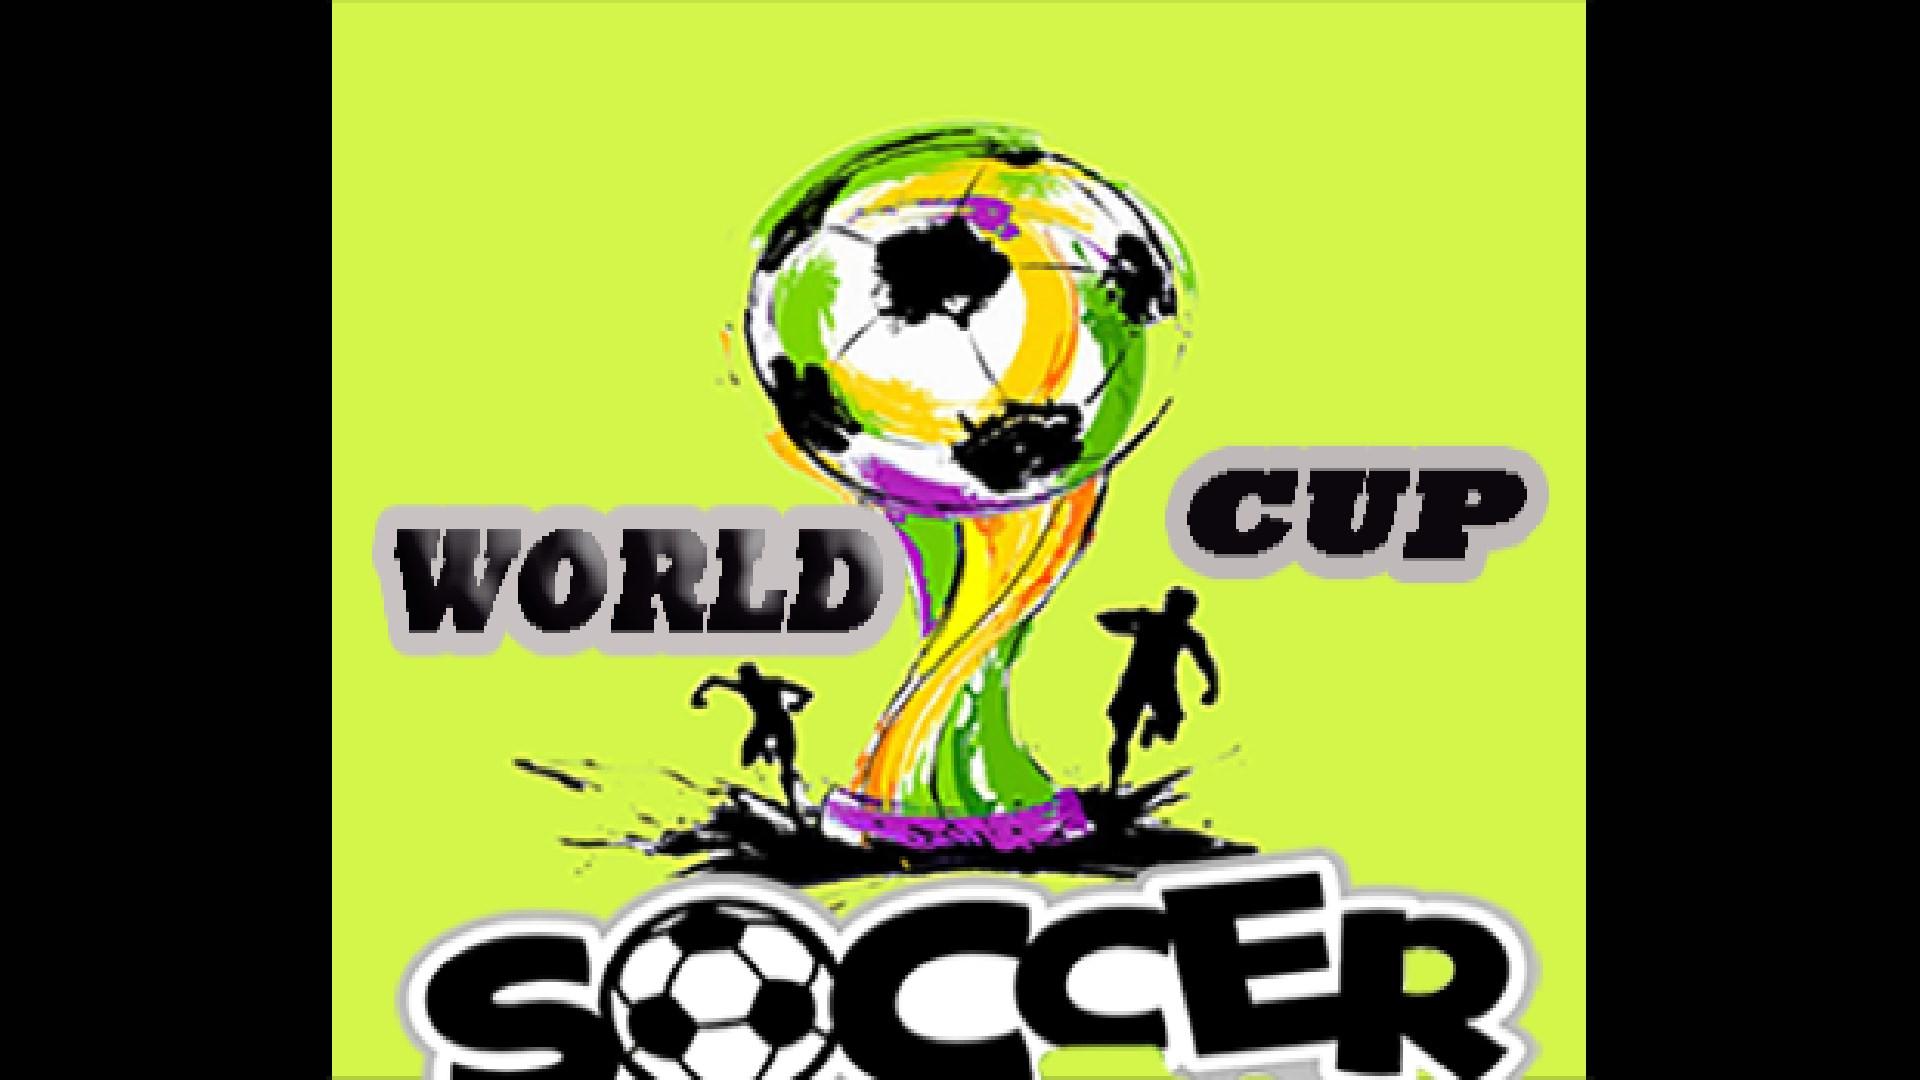 Get WorldCup Soccer - Microsoft Store en-SA